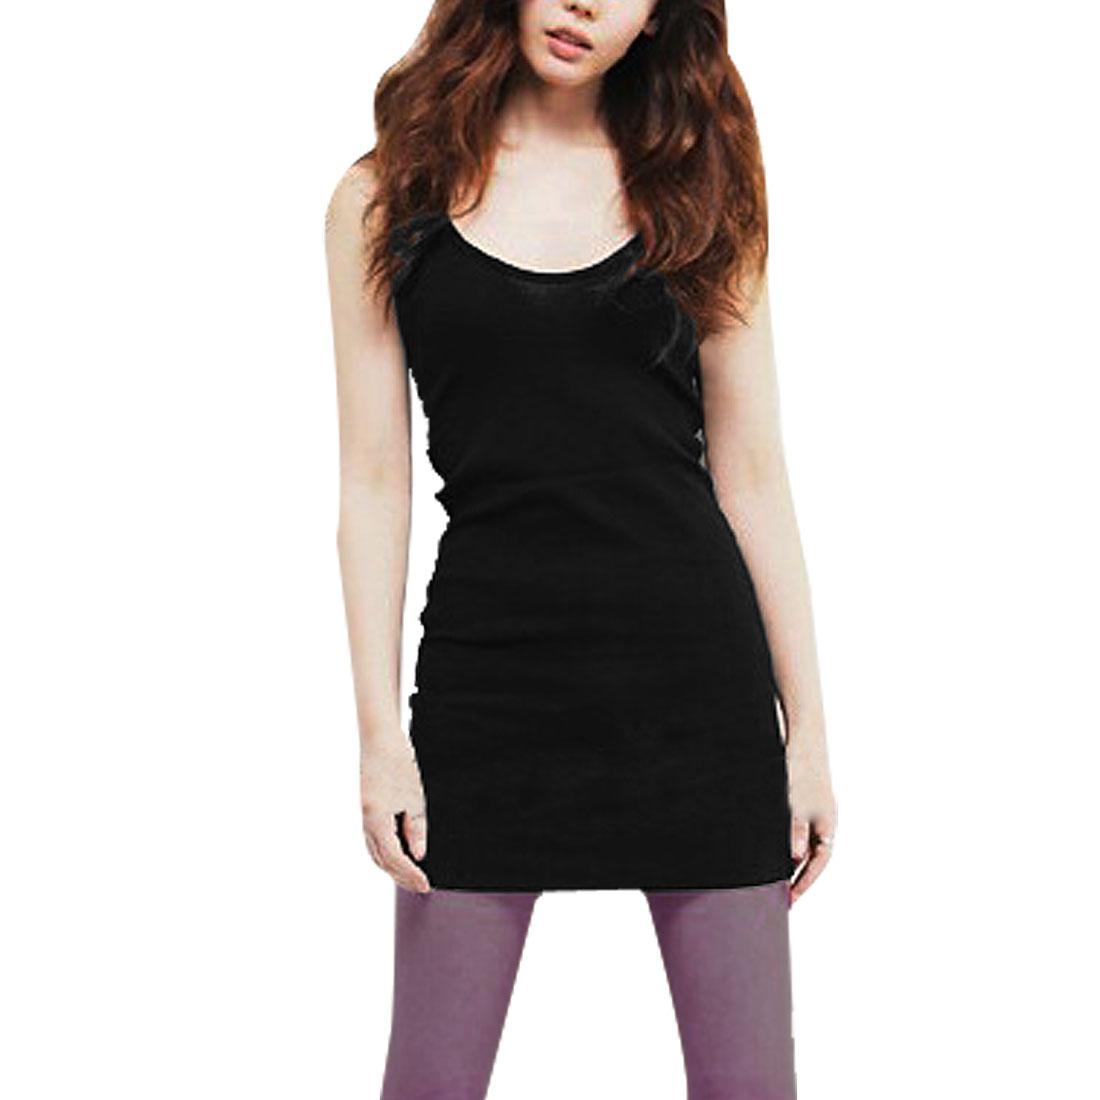 Woman Summer Fashional Tightfitting Elastic Mini Dress Black XS